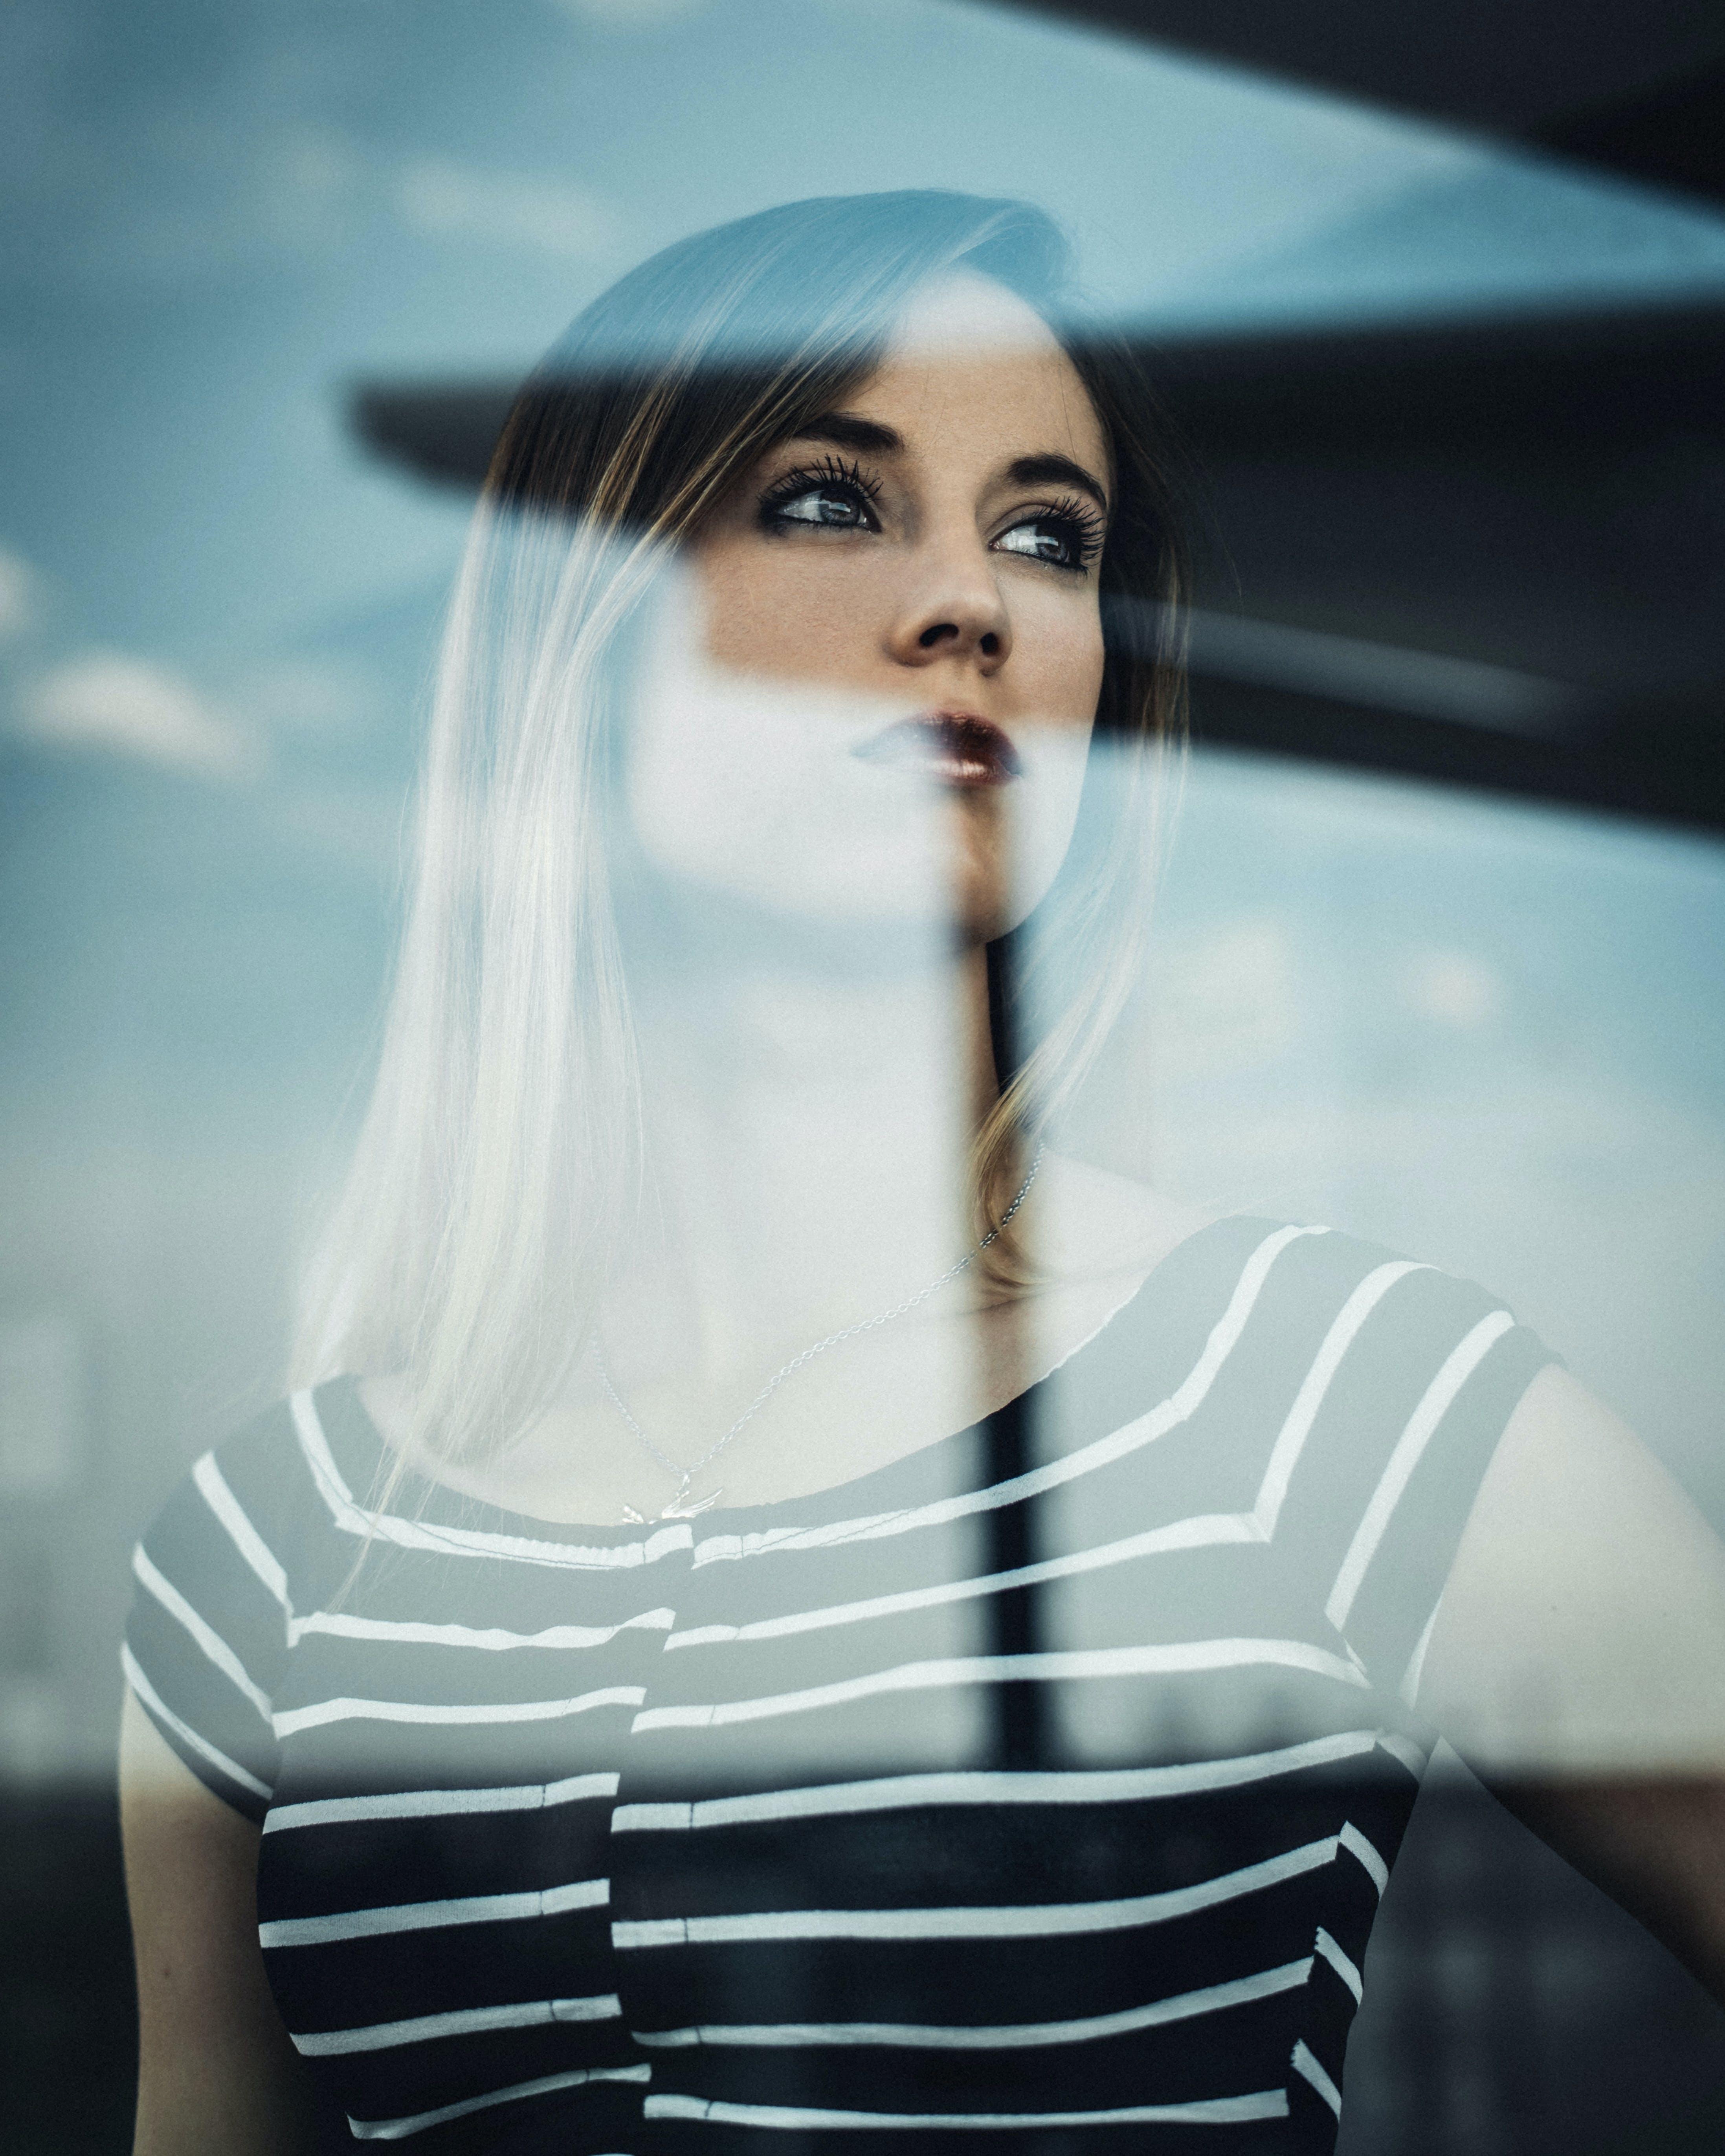 Woman Wearing Striped Shirt